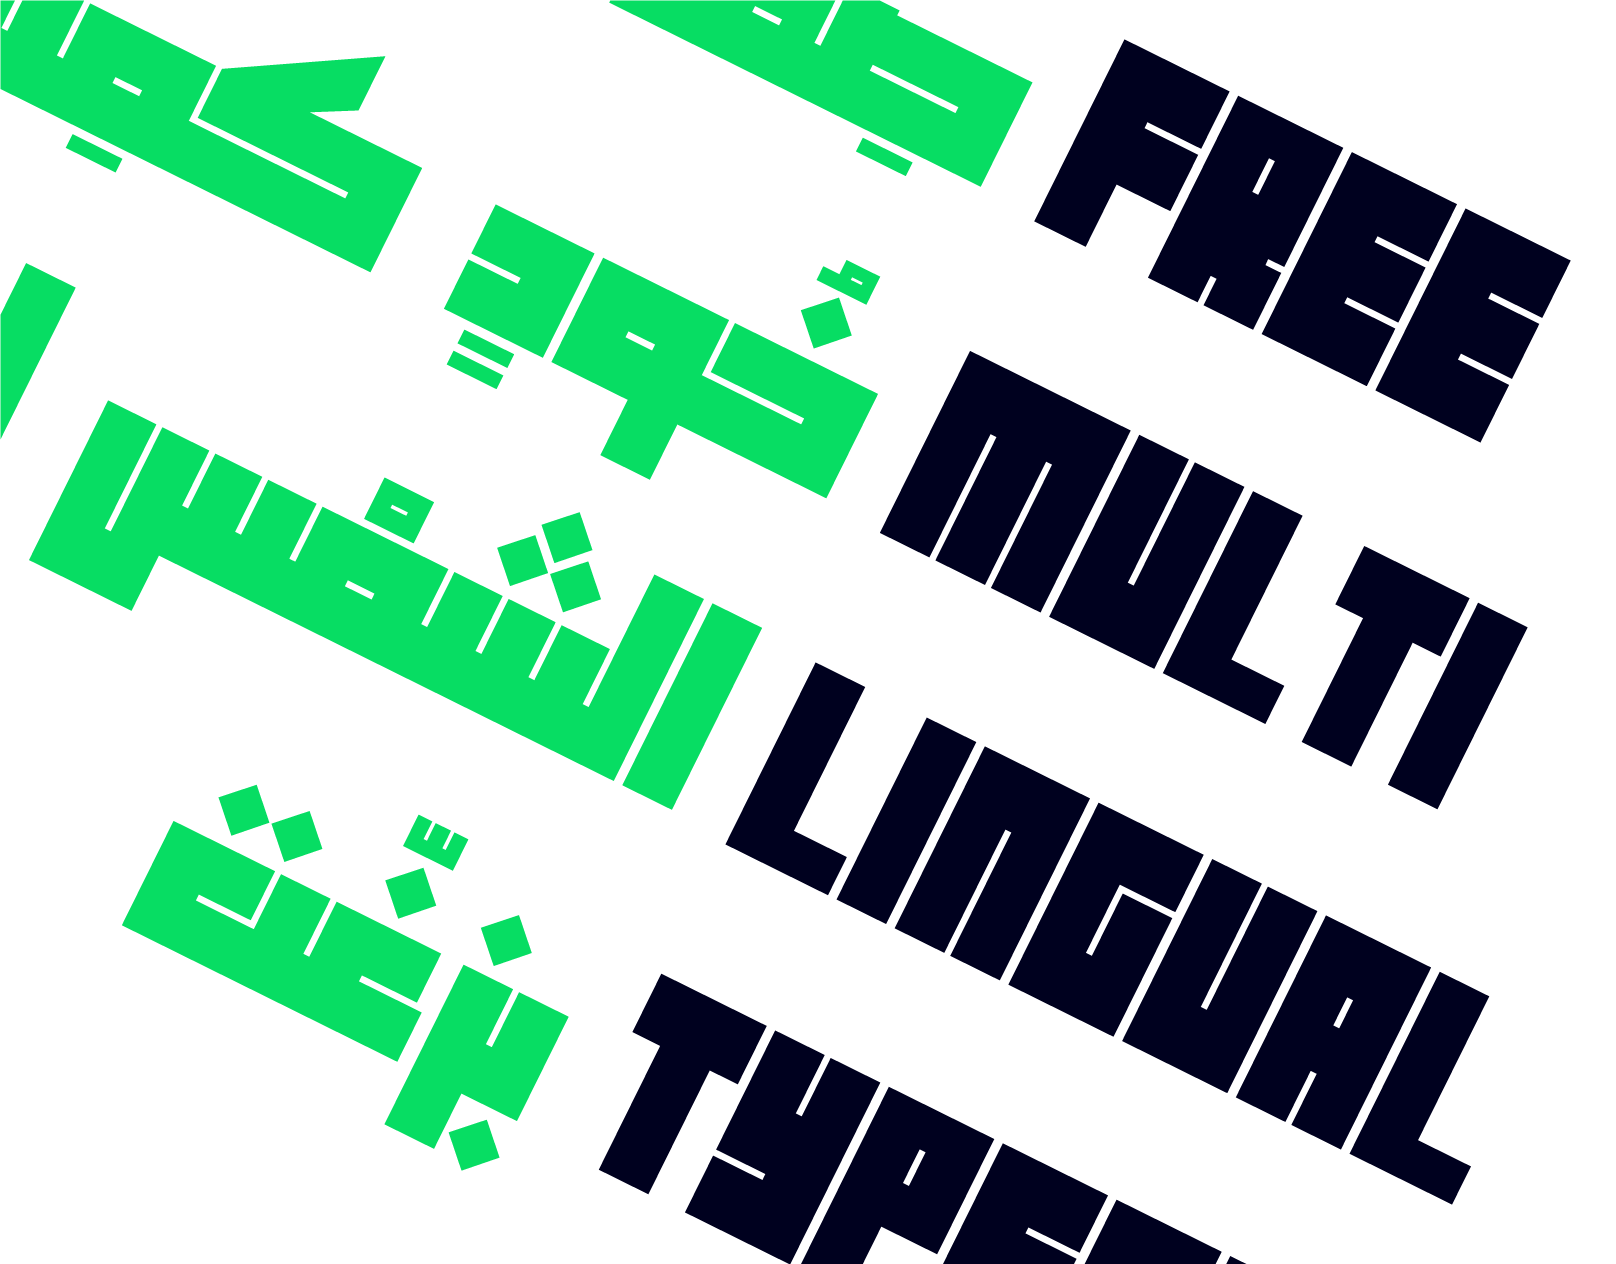 Kufidia Free Font in 2020 | Free font, Tech company logos ...